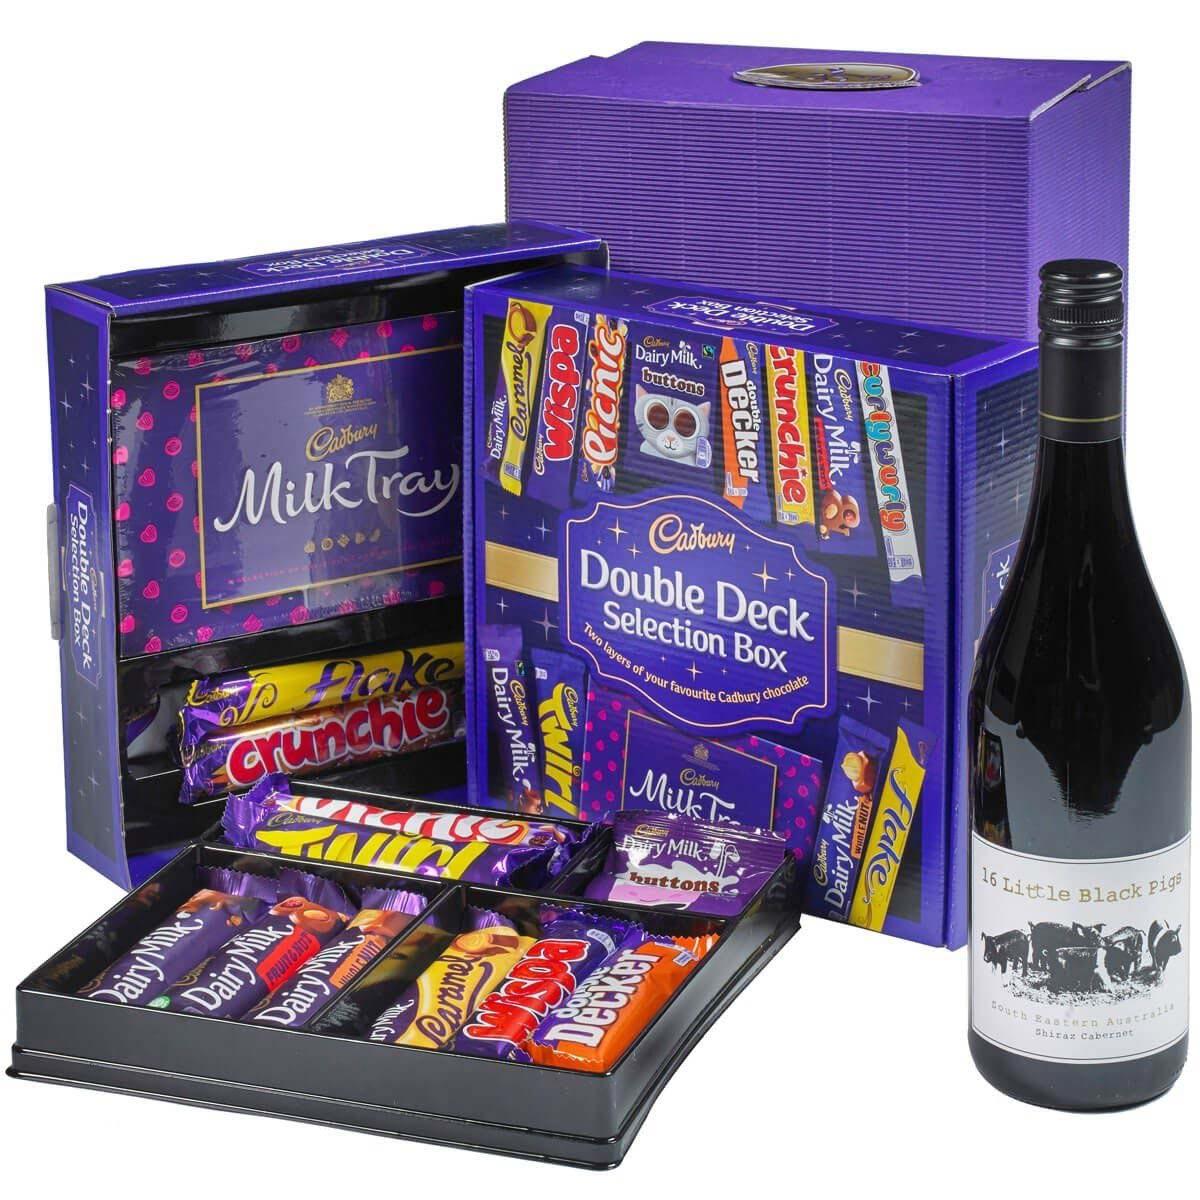 Cadbury Selection Box & Red Wine Gift